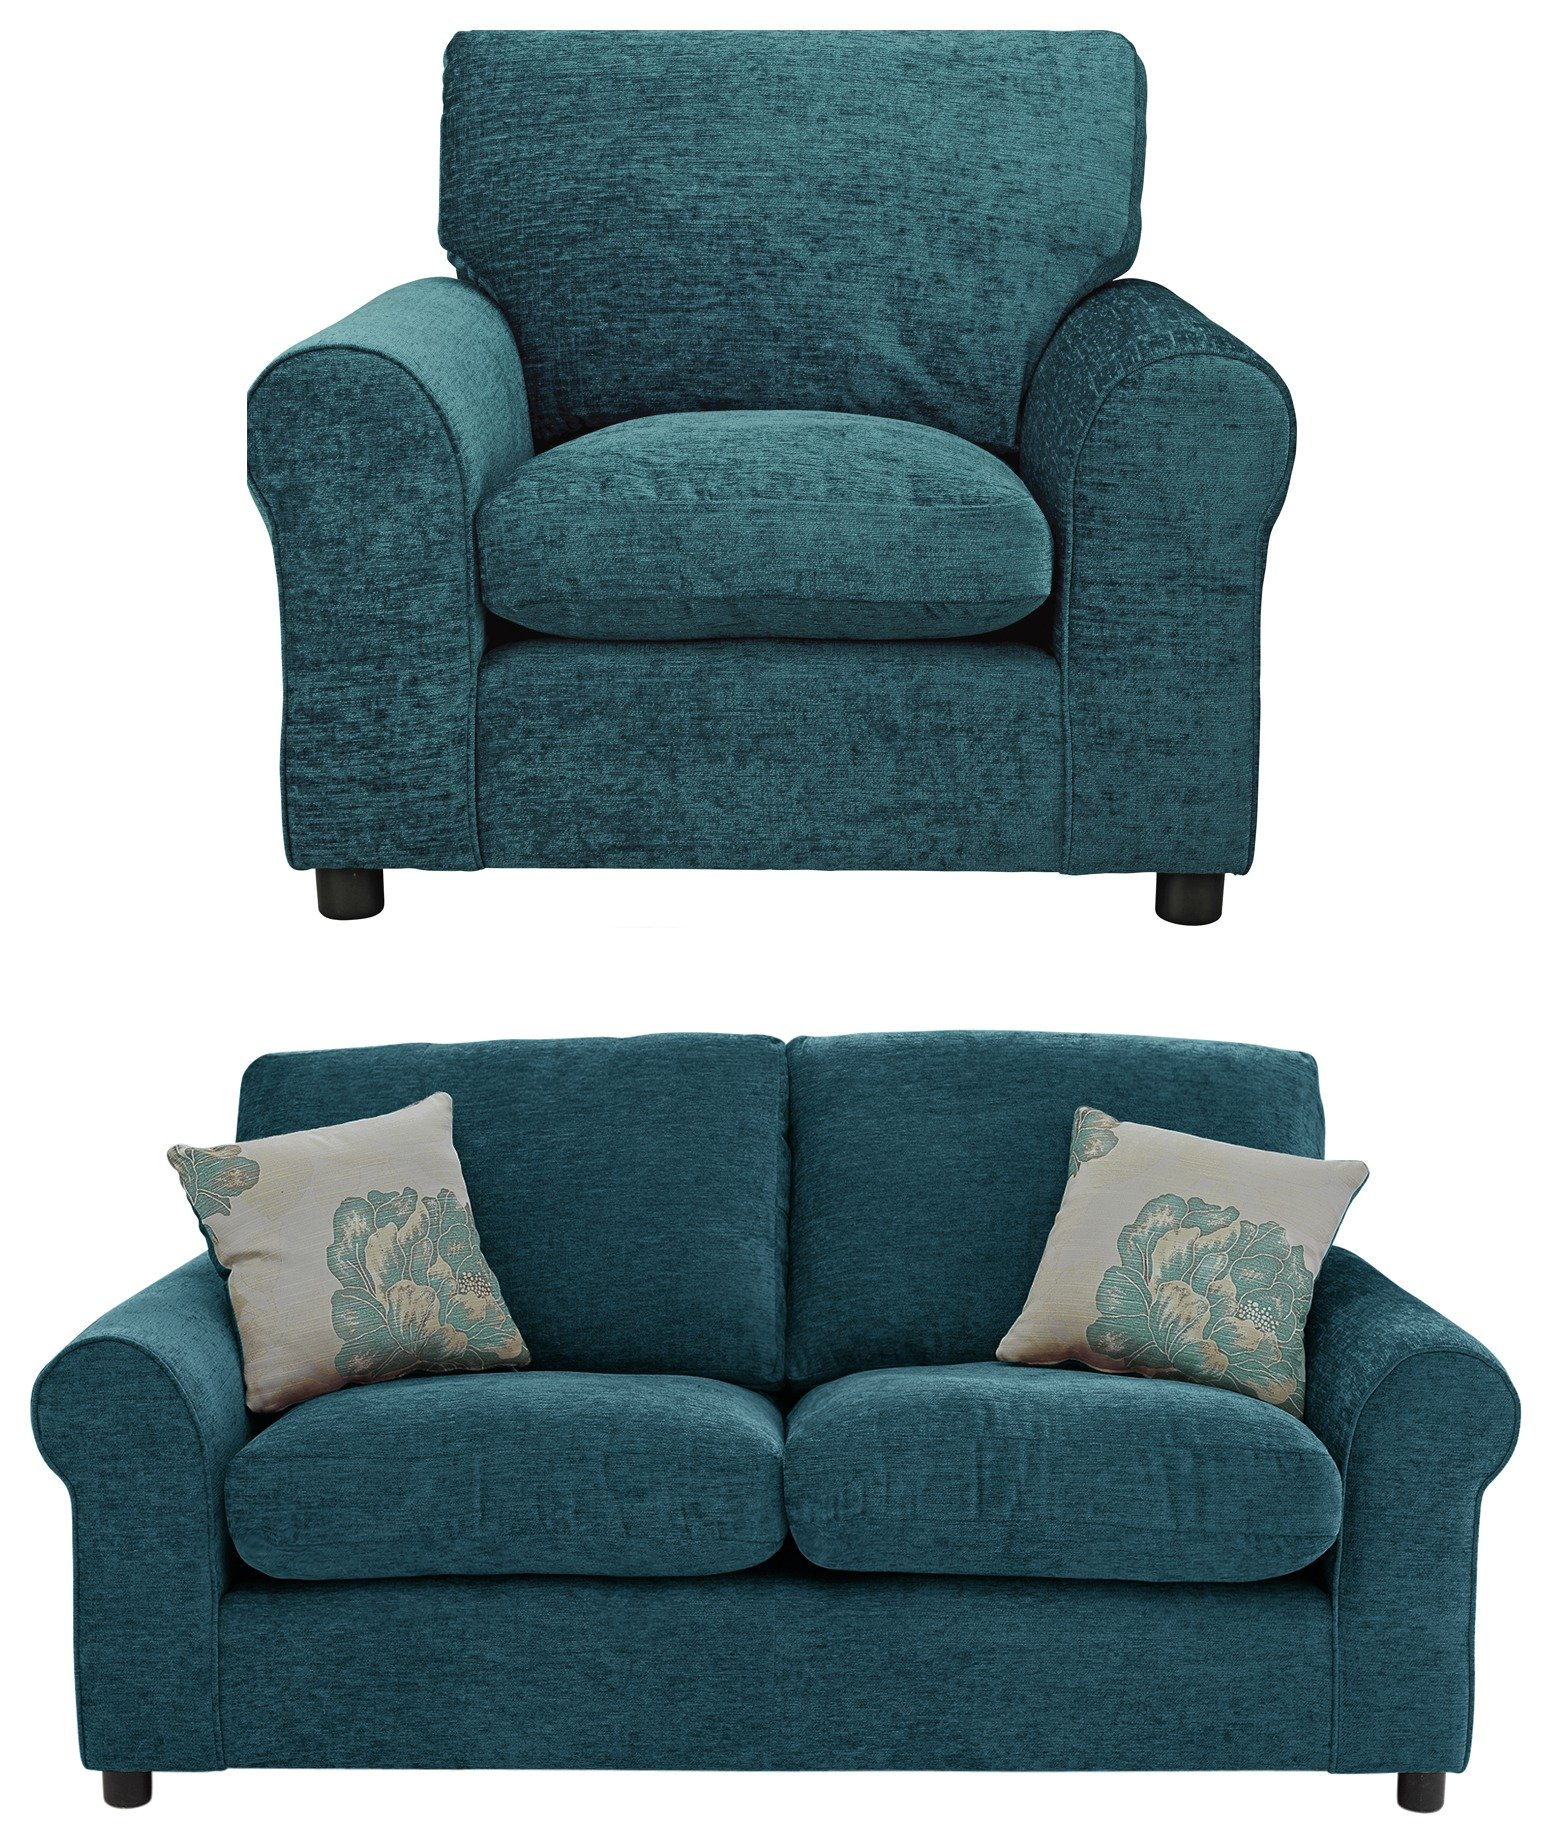 HOME - Tessa Regular Fabric - Sofa and Chair - Teal